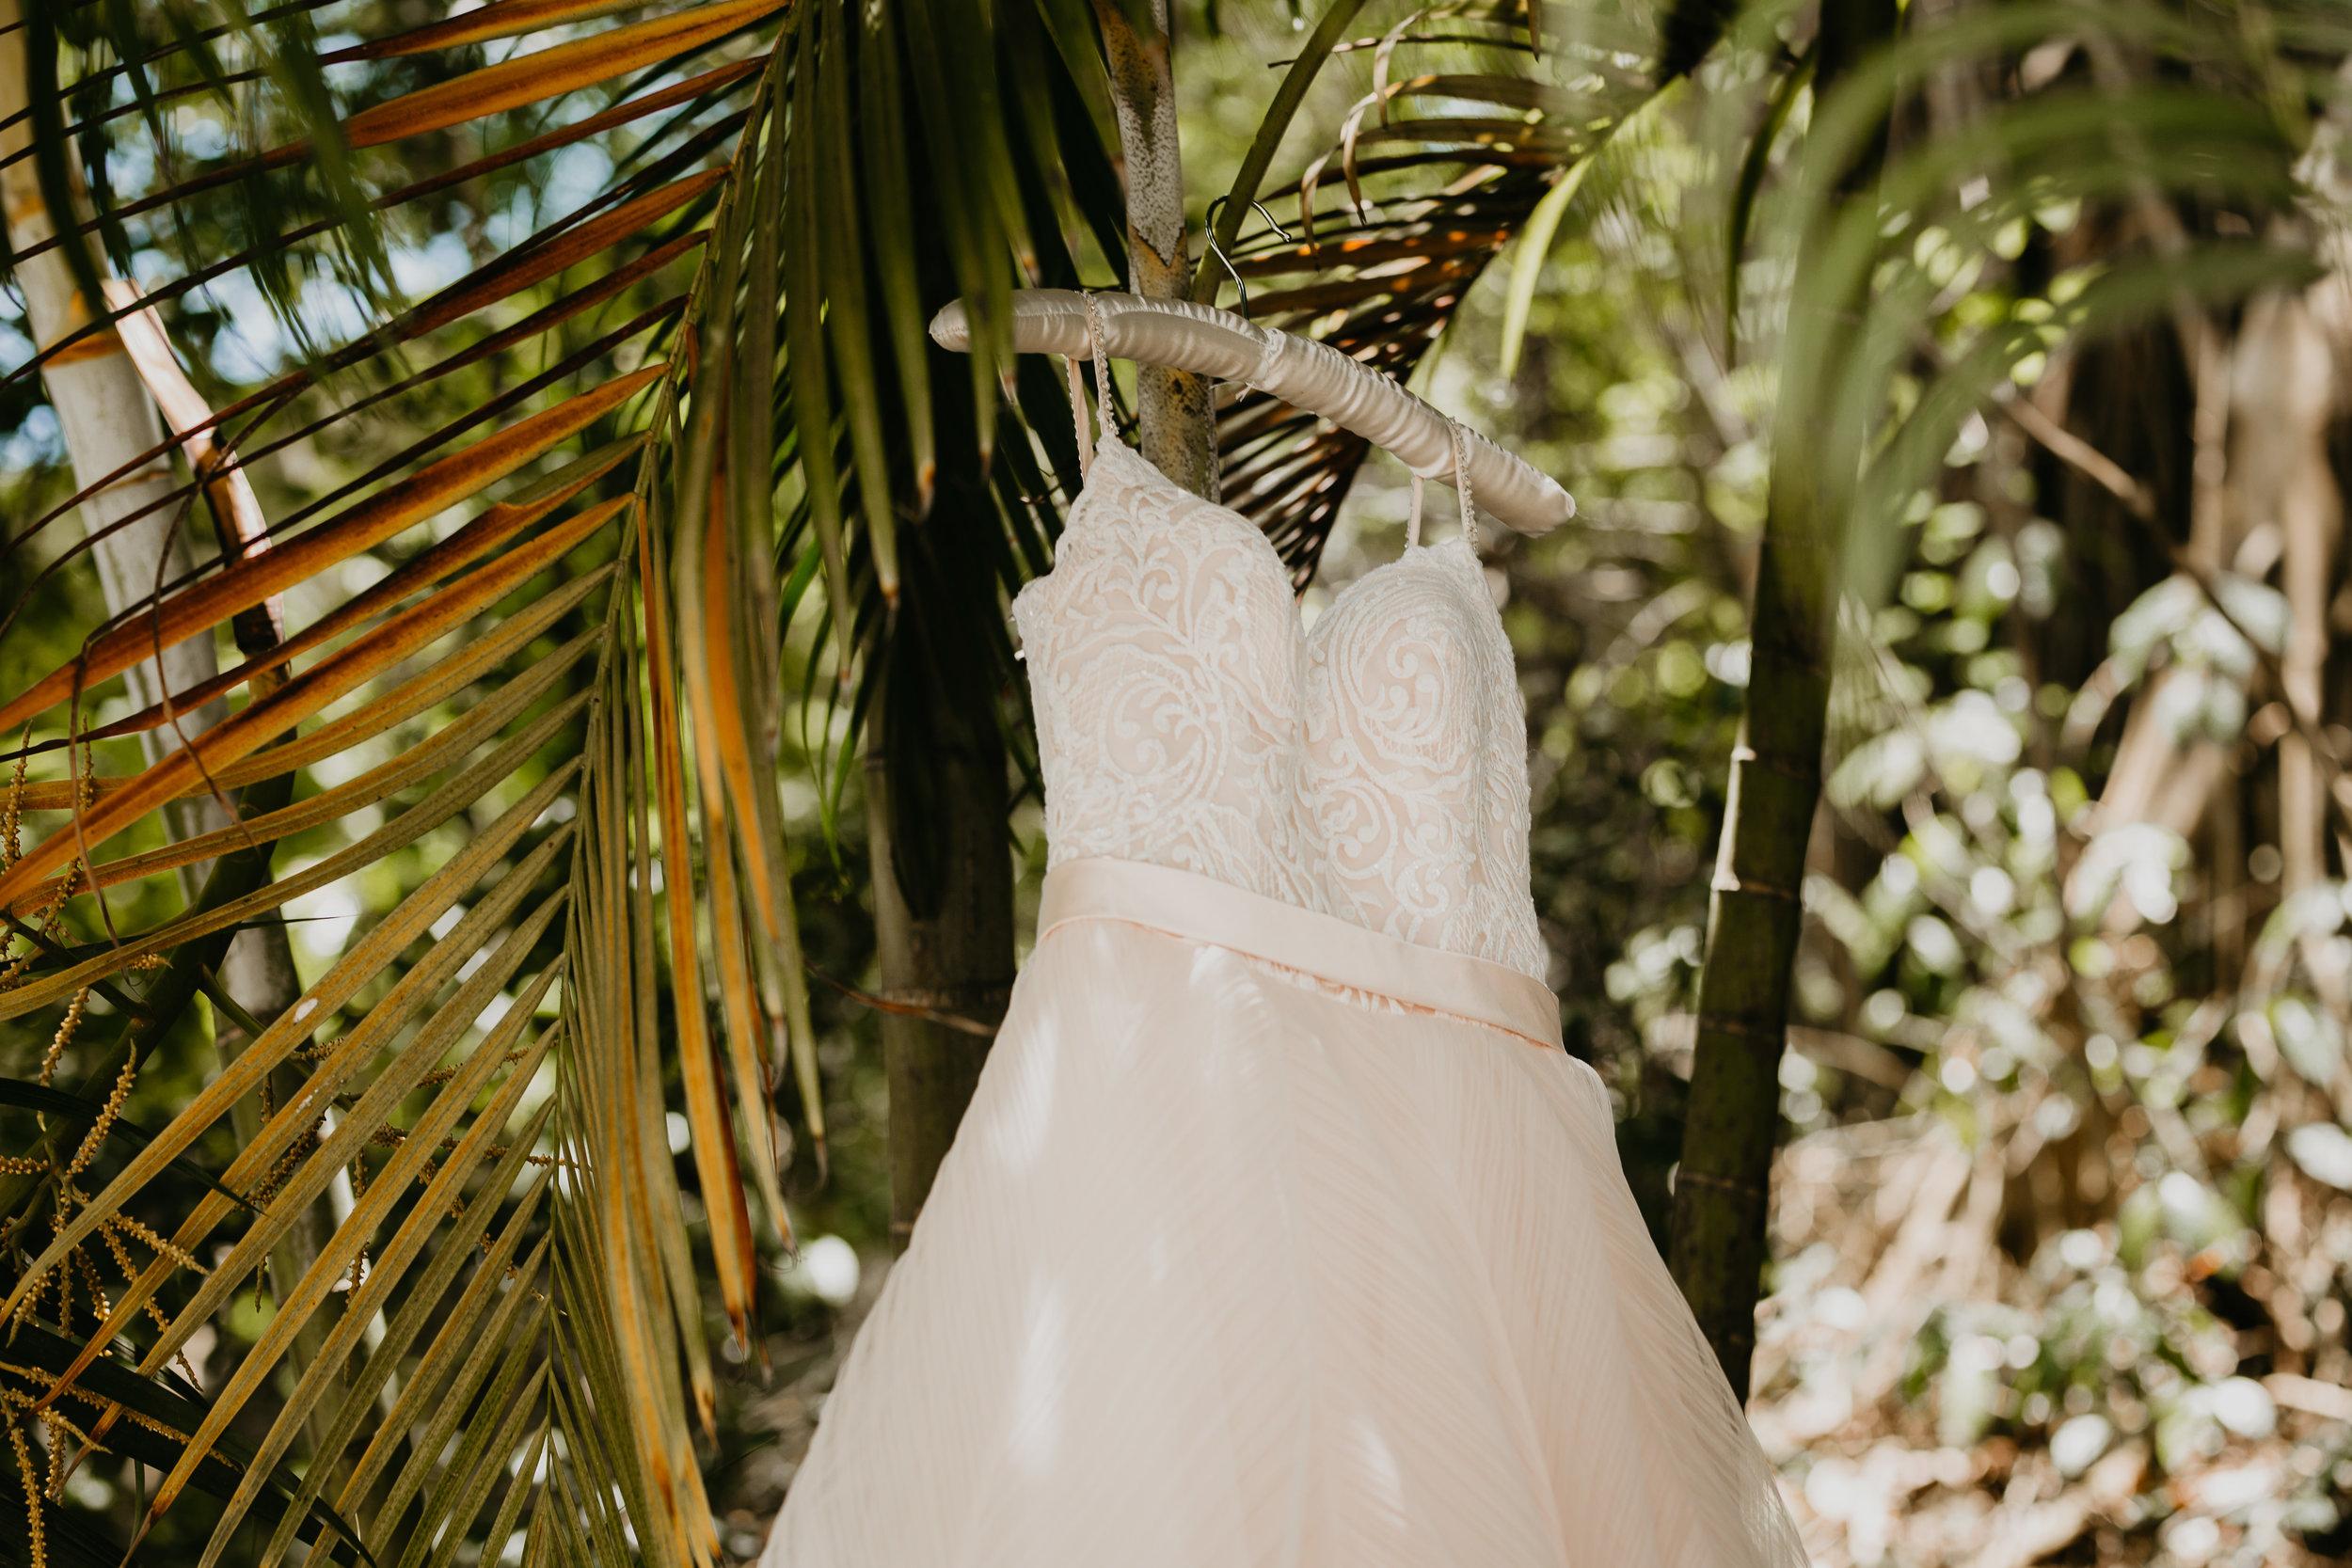 nicole-daacke-photography-destination-wedding-in-st-lucia-sandals-la-toc-intimate-island-wedding-carribean-elopement-photographer-chill-island-wedding-3.jpg